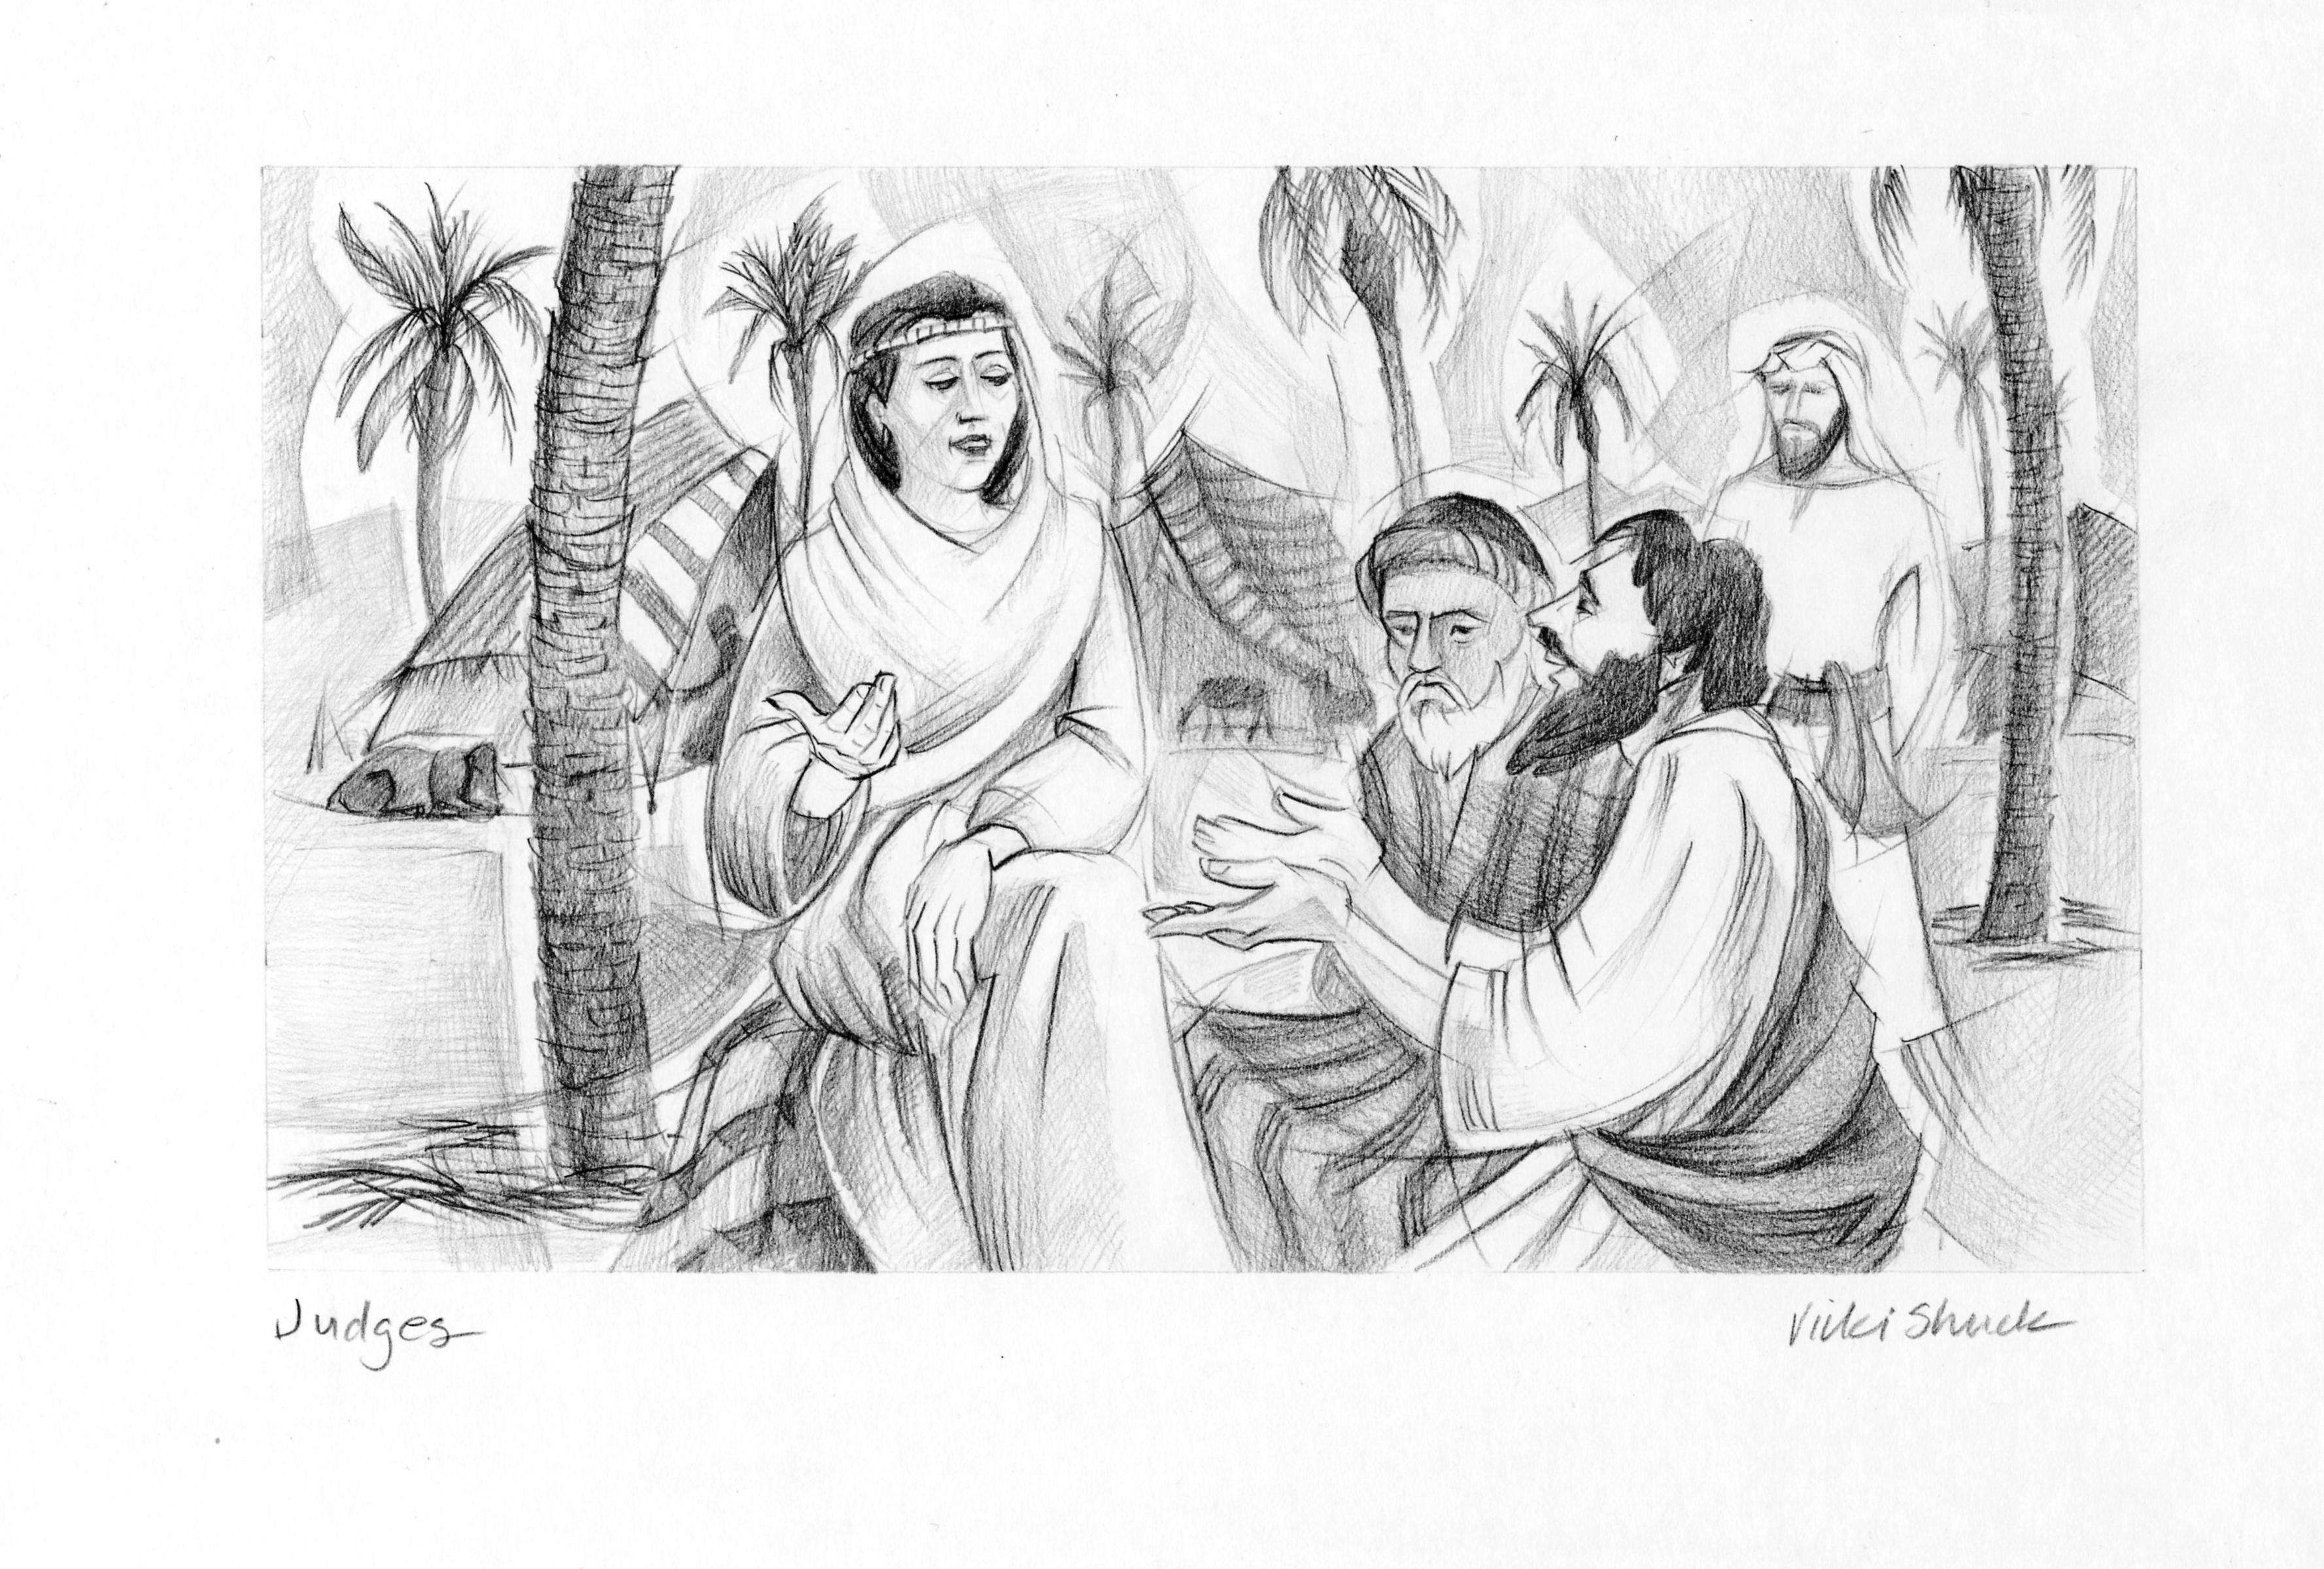 Judges 4 5 Illustration